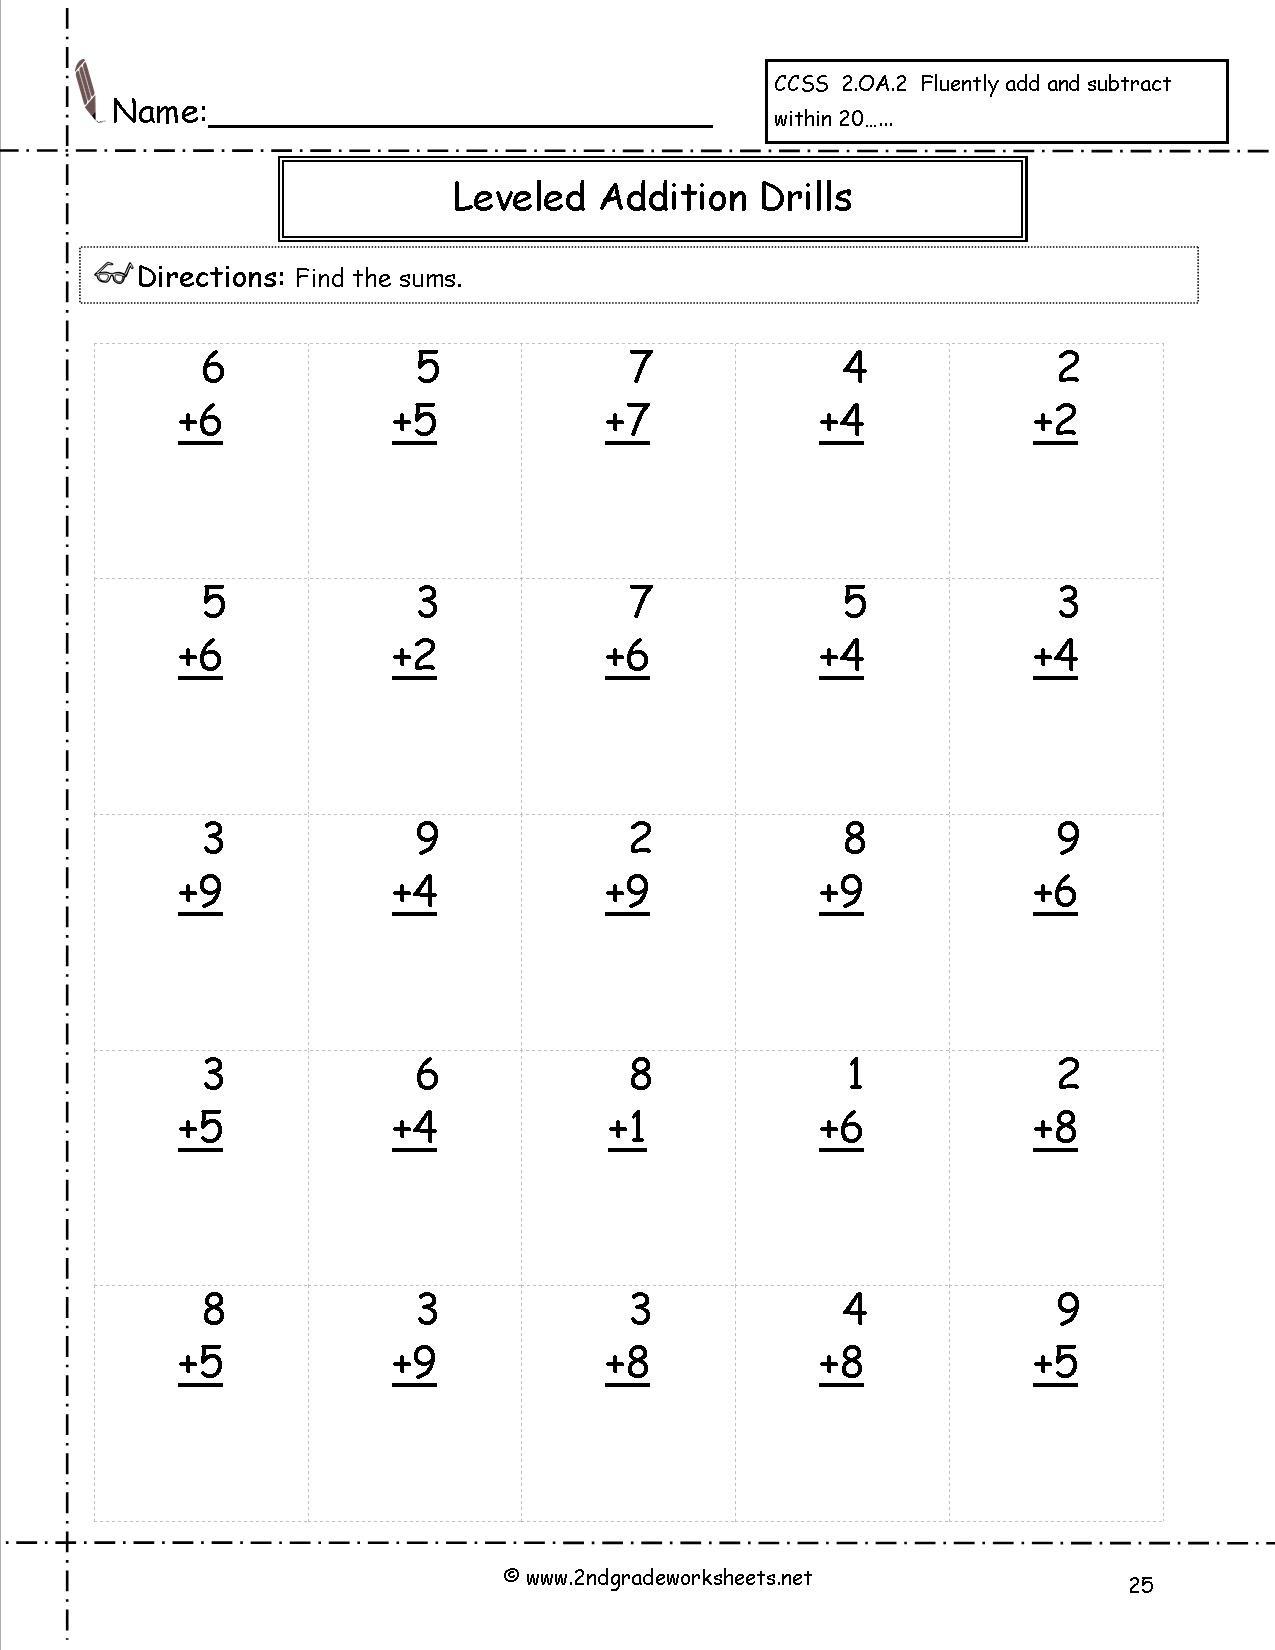 Free Math Worksheets And Printouts - Year 2 Maths Worksheets Free Printable